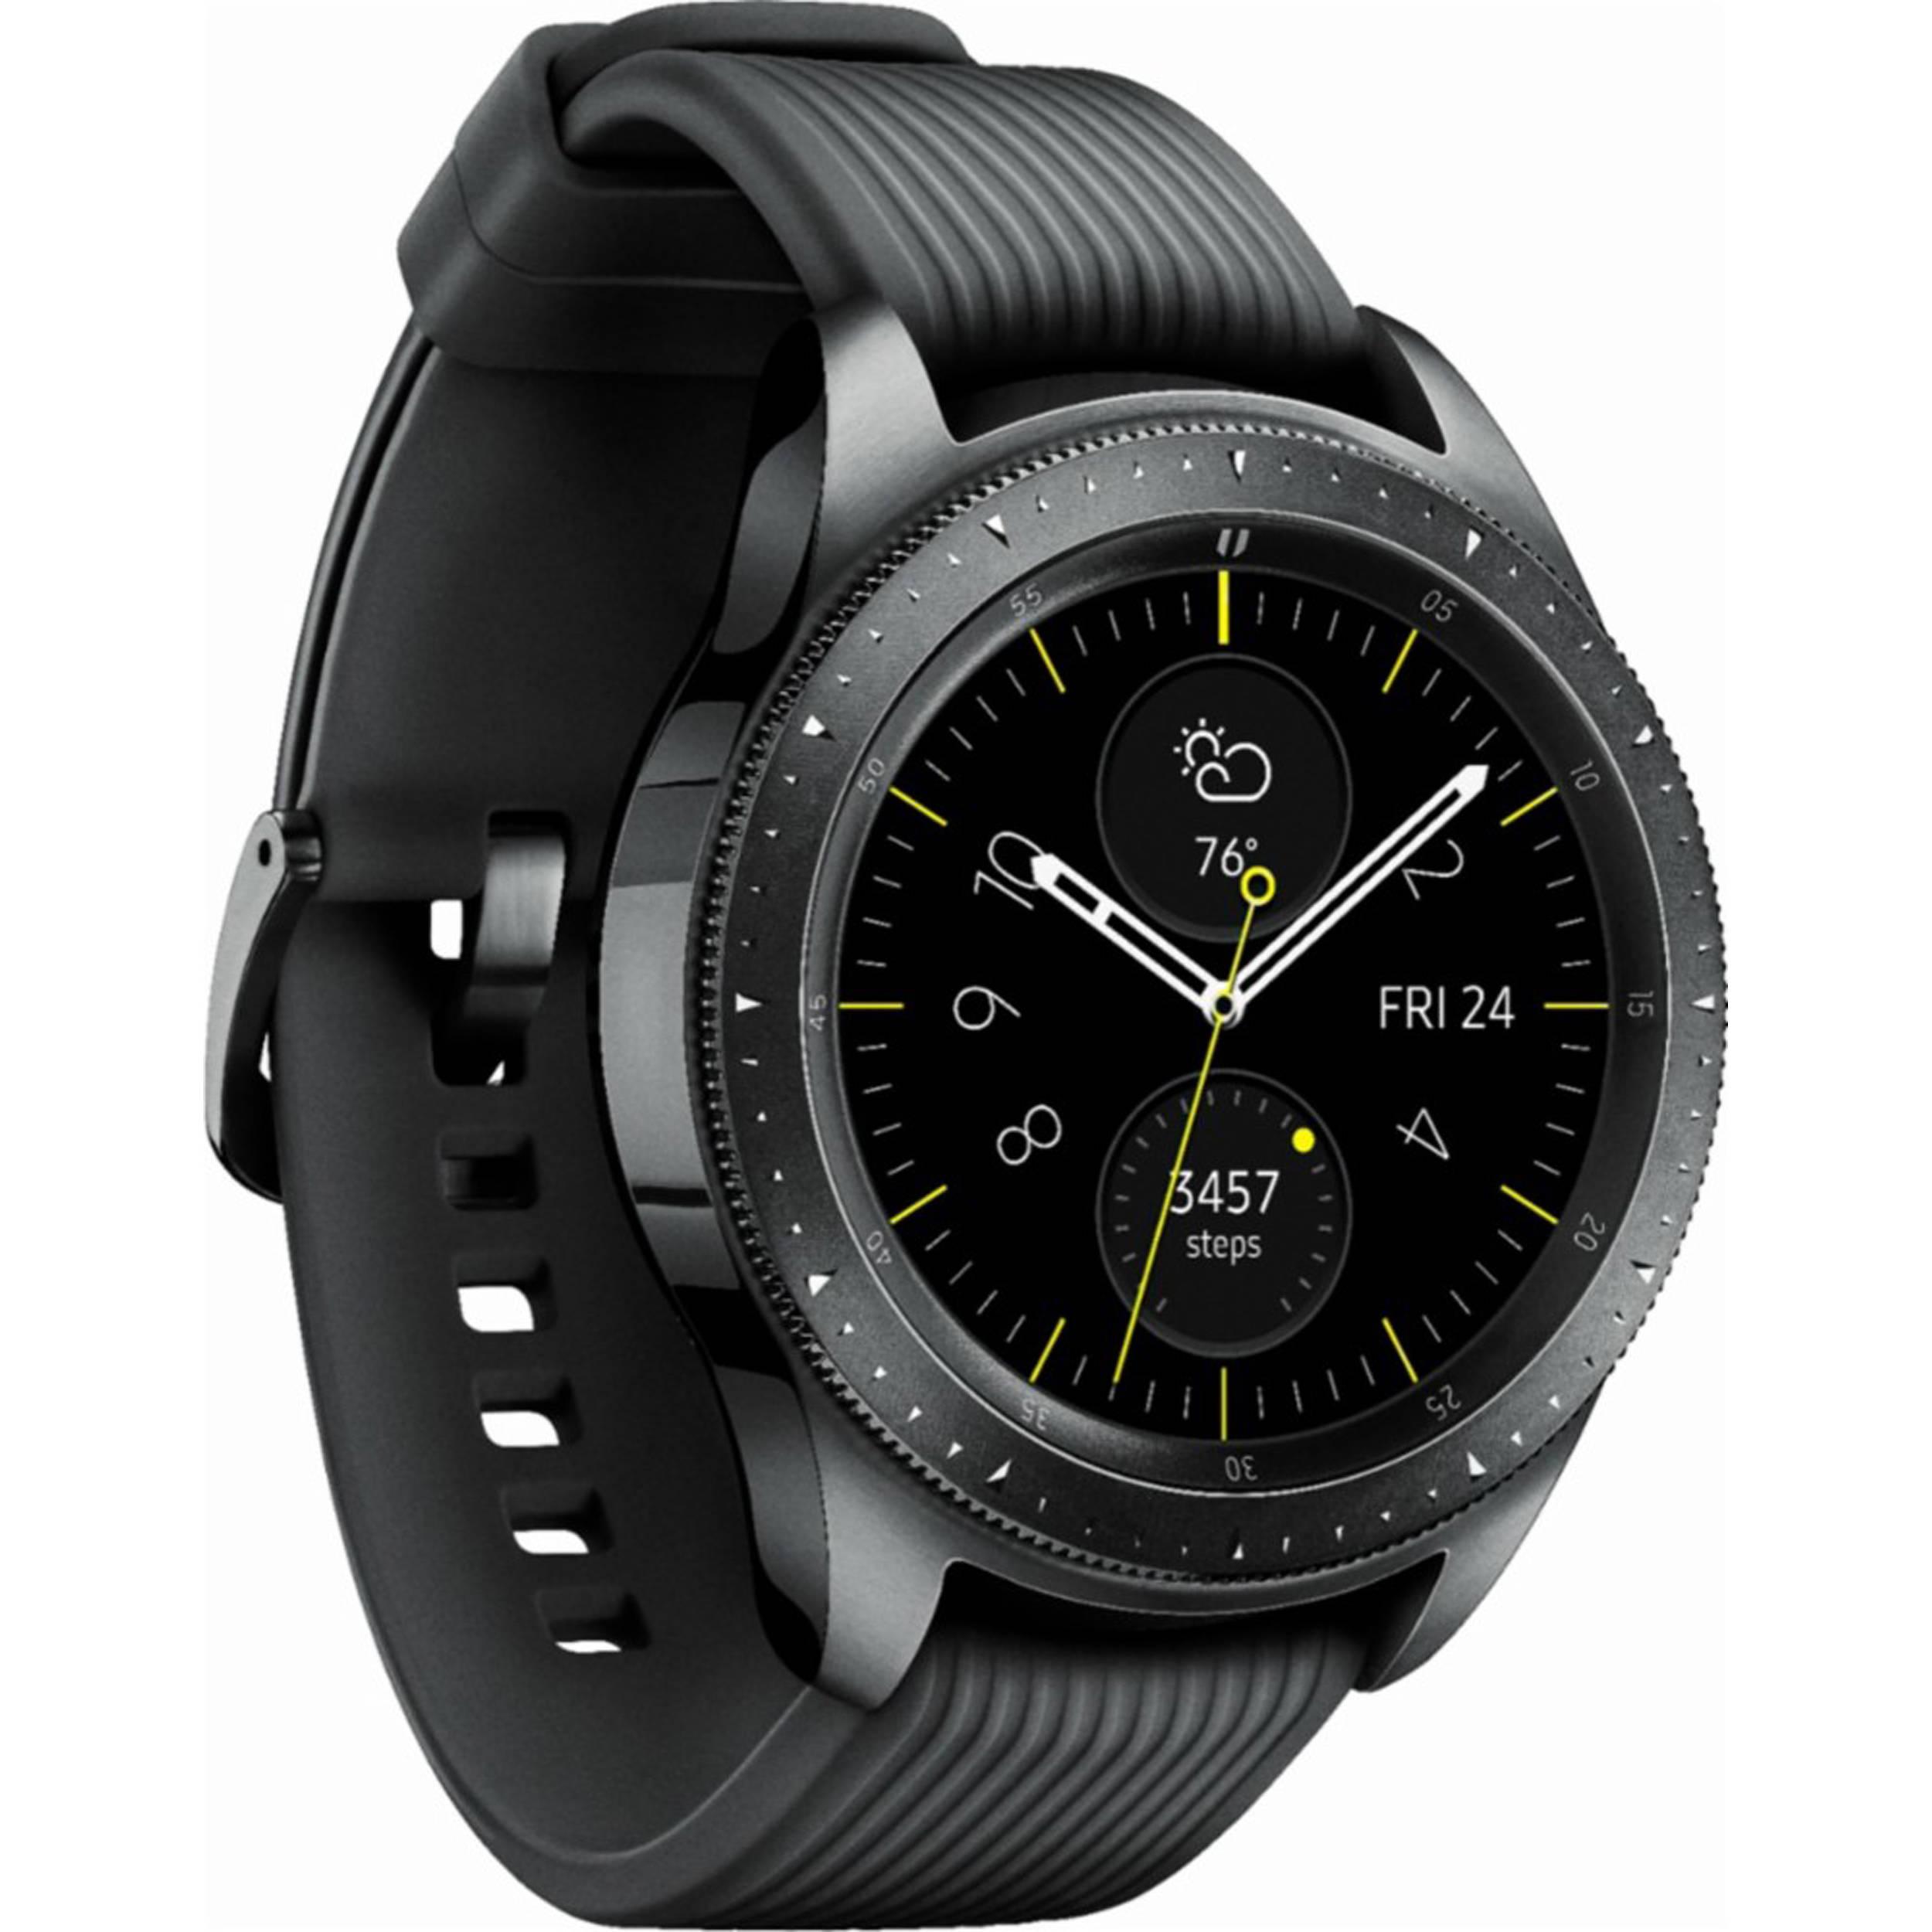 Samsung Galaxy Watch SM-R810NZKAXAR B&H Photo Video